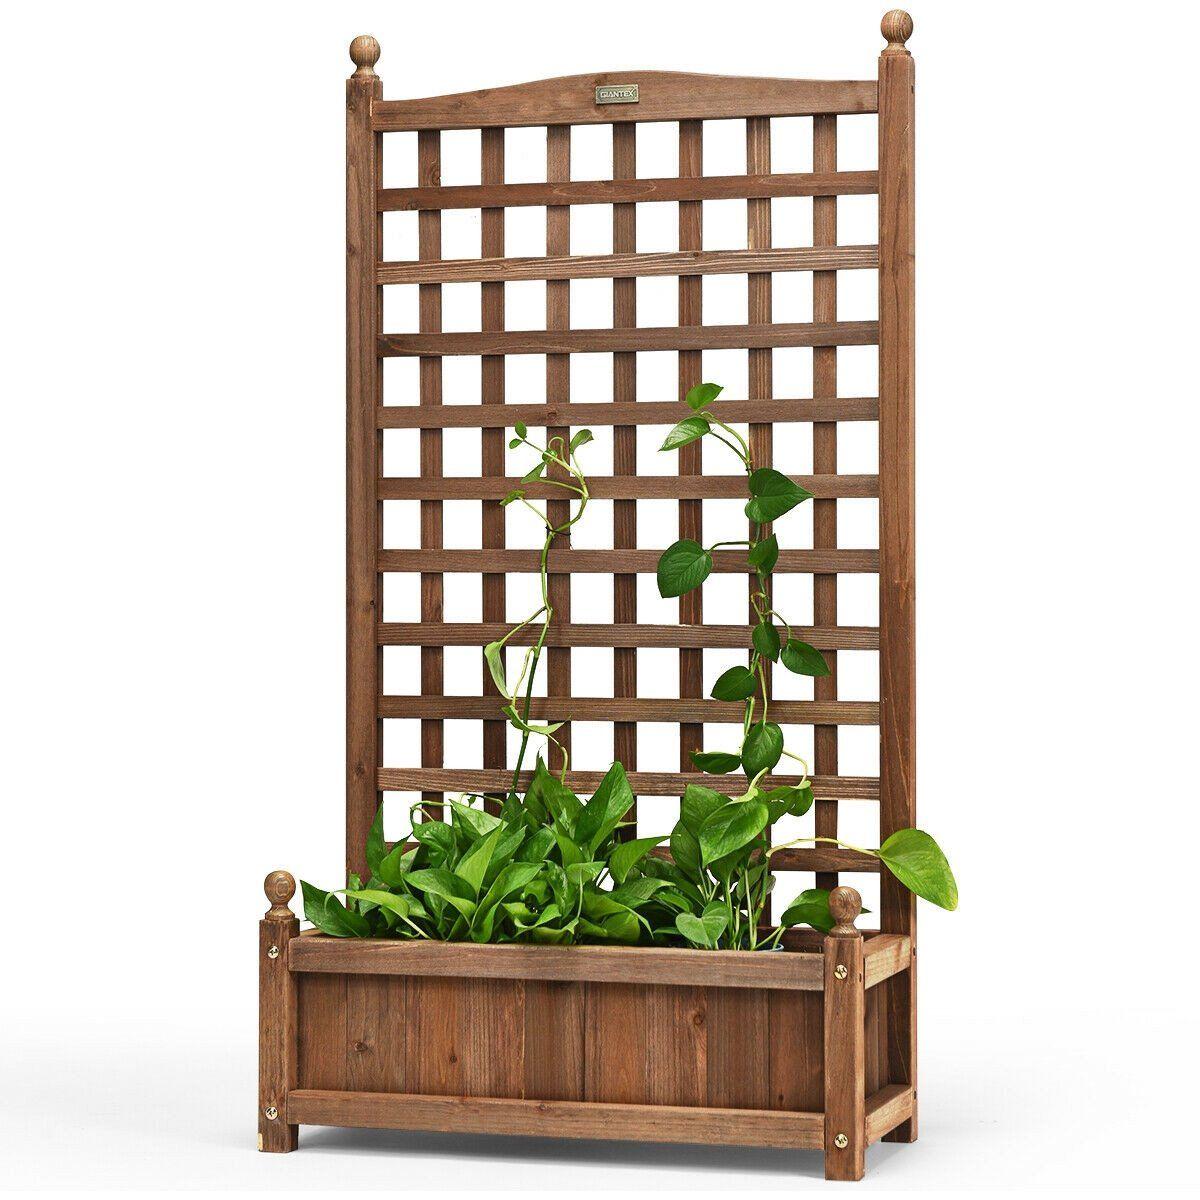 25 X11 X48 Planter With Trellis Fir Wood Outdoor Garden Flower Vine Plant Box Walmart Com Walmart In 2020 Planter Box With Trellis Wood Planters Wood Planter Box